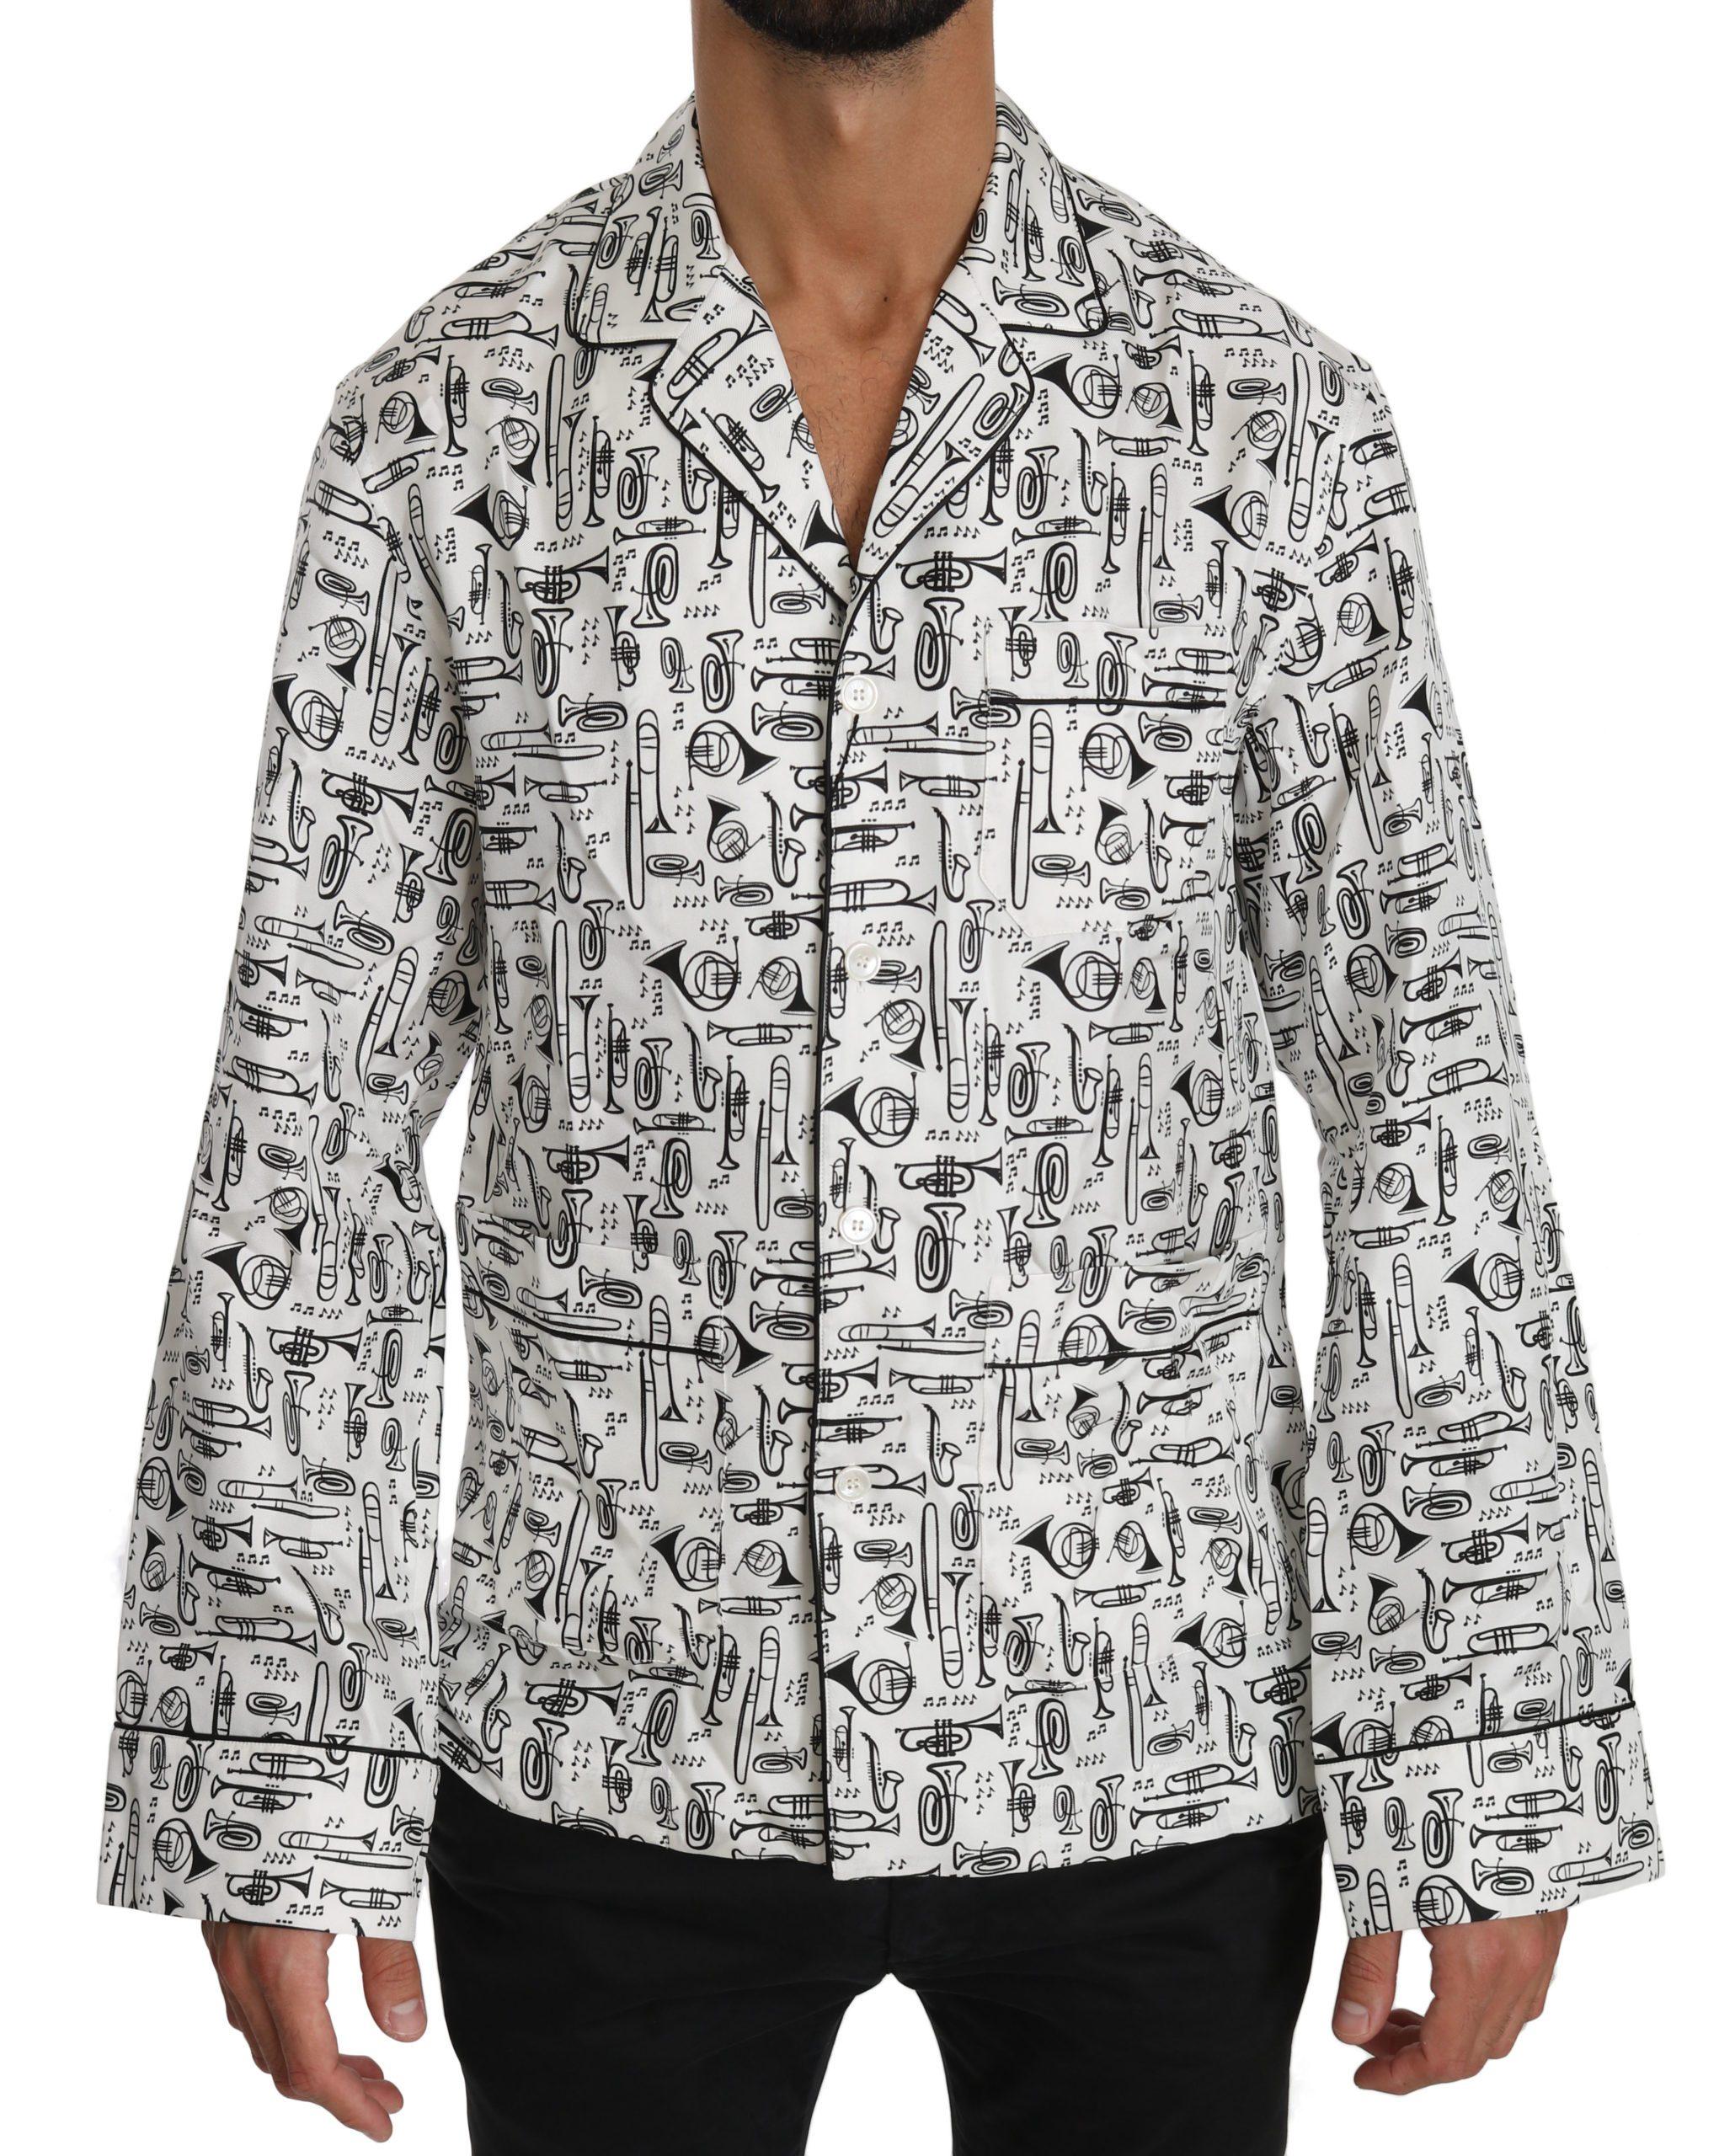 Dolce & Gabbana Men's Musical Instrument Silk Shirt White TSH4008 - IT37 | XS